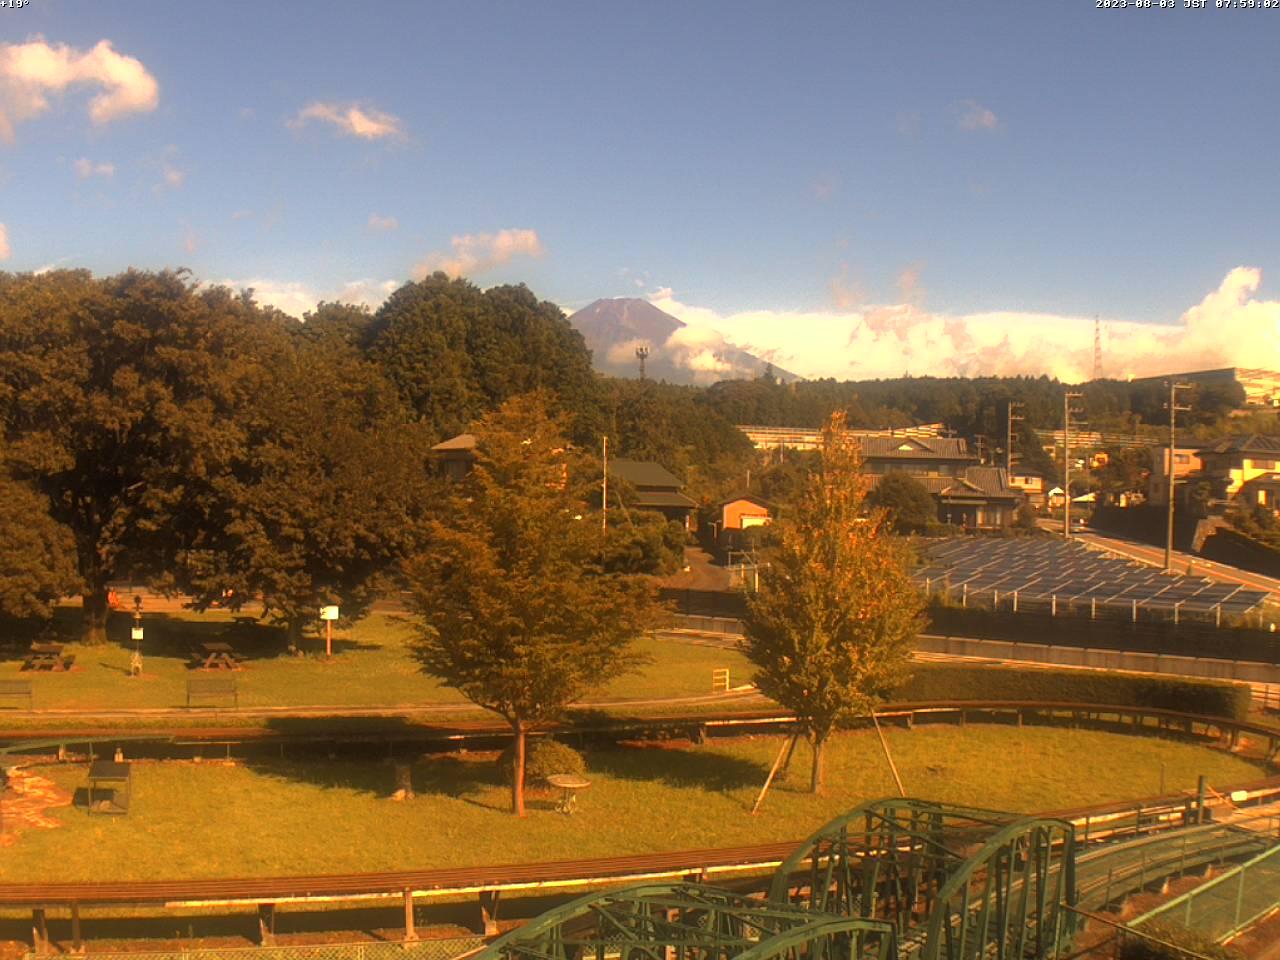 富士山ライブカメラ(裾野市望遠カメラ)